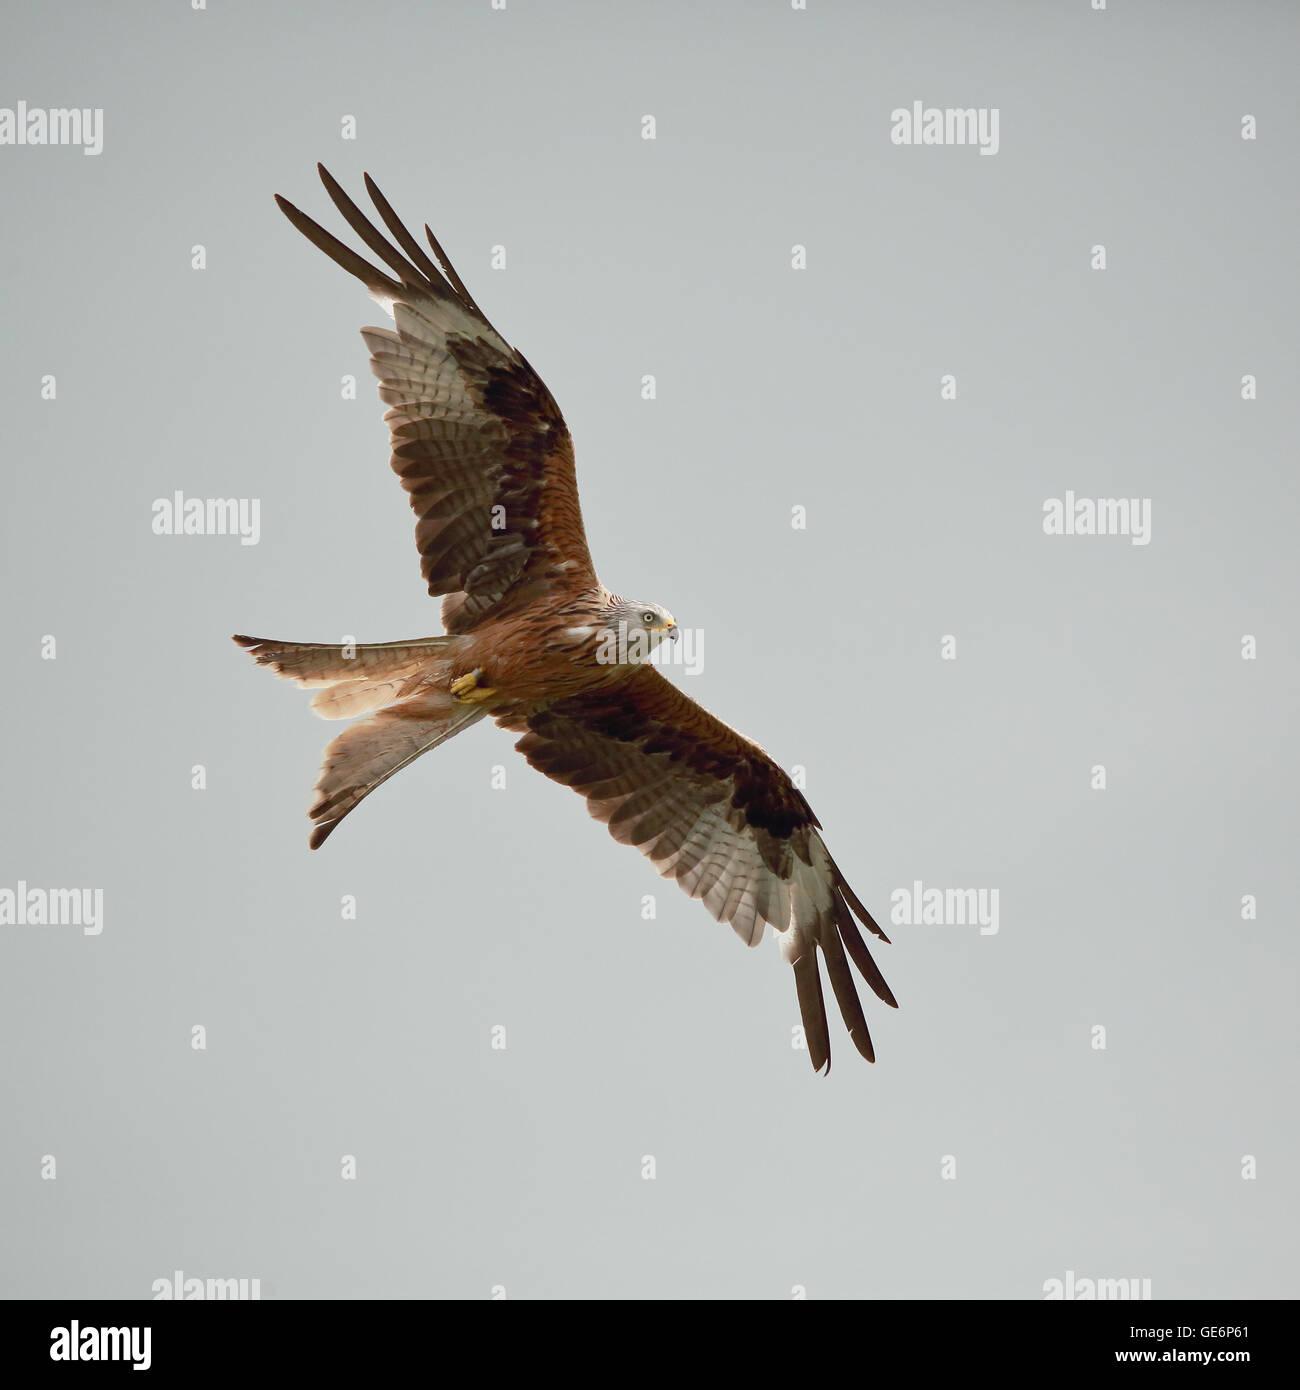 Red Kite en vuelo contra un cielo gris Foto de stock